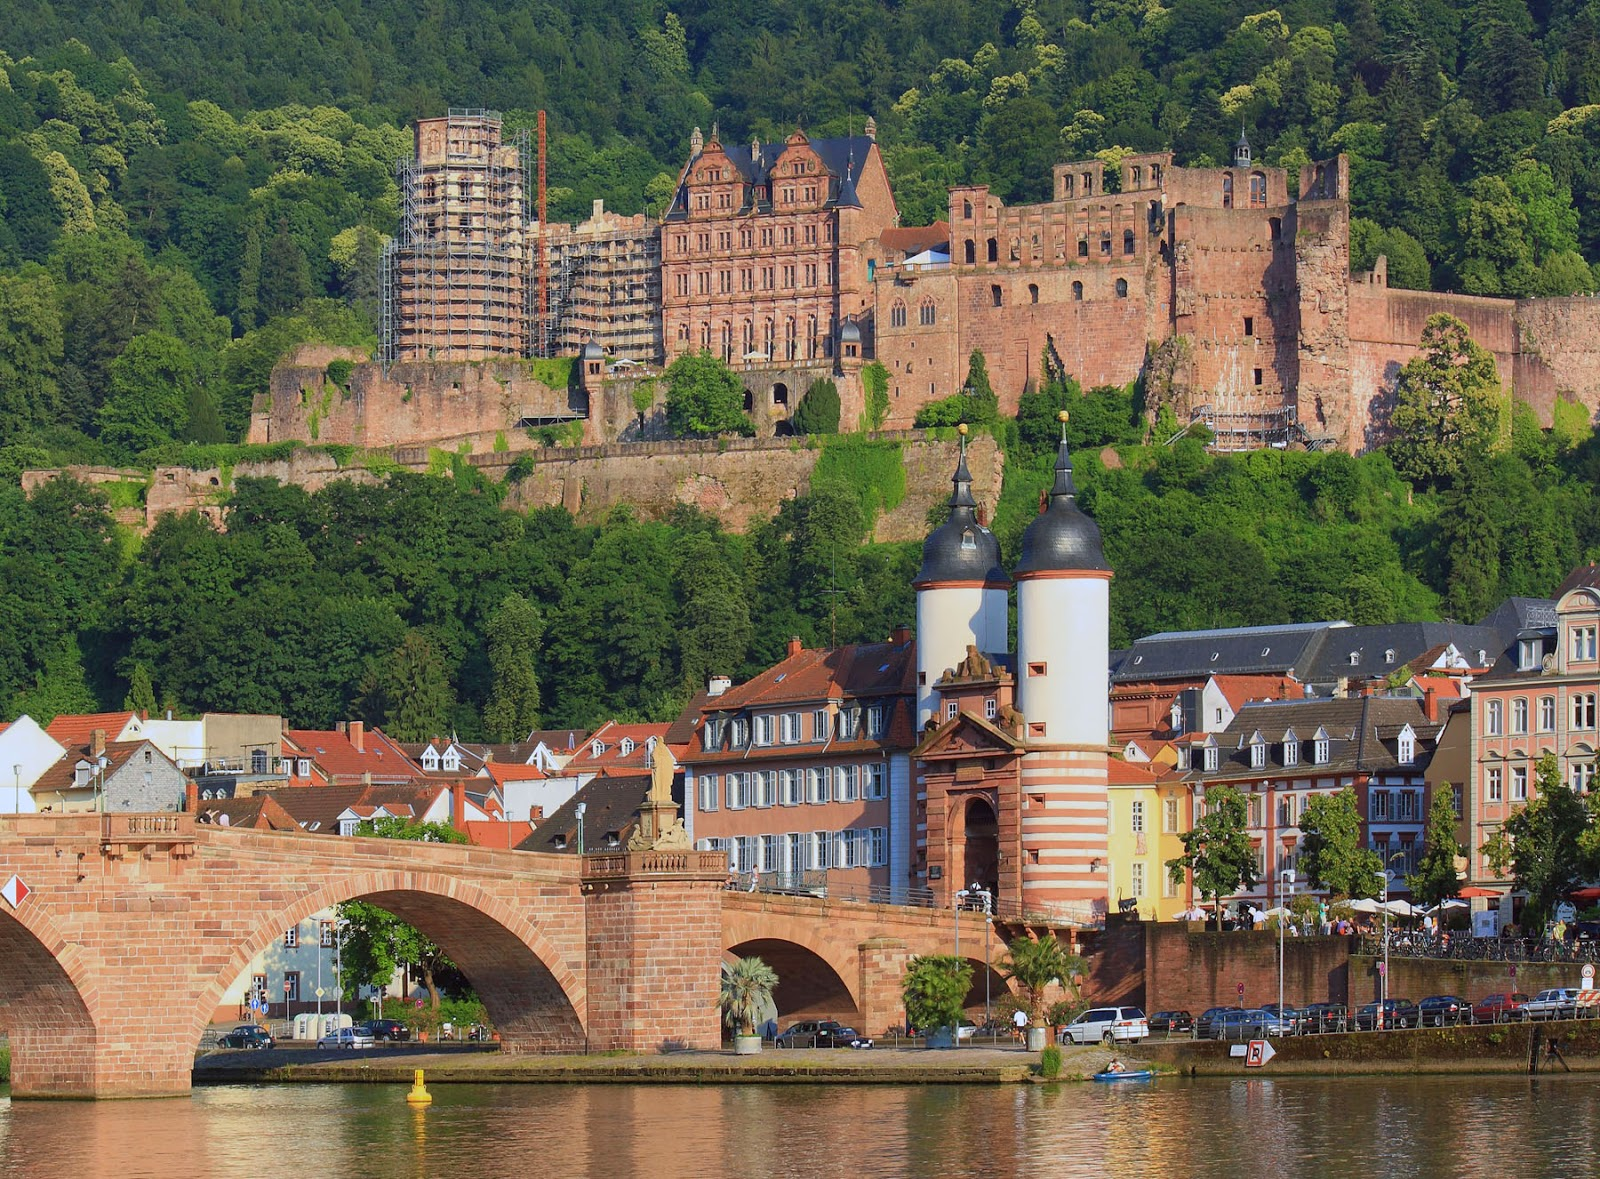 Heidelberg Boat Tour